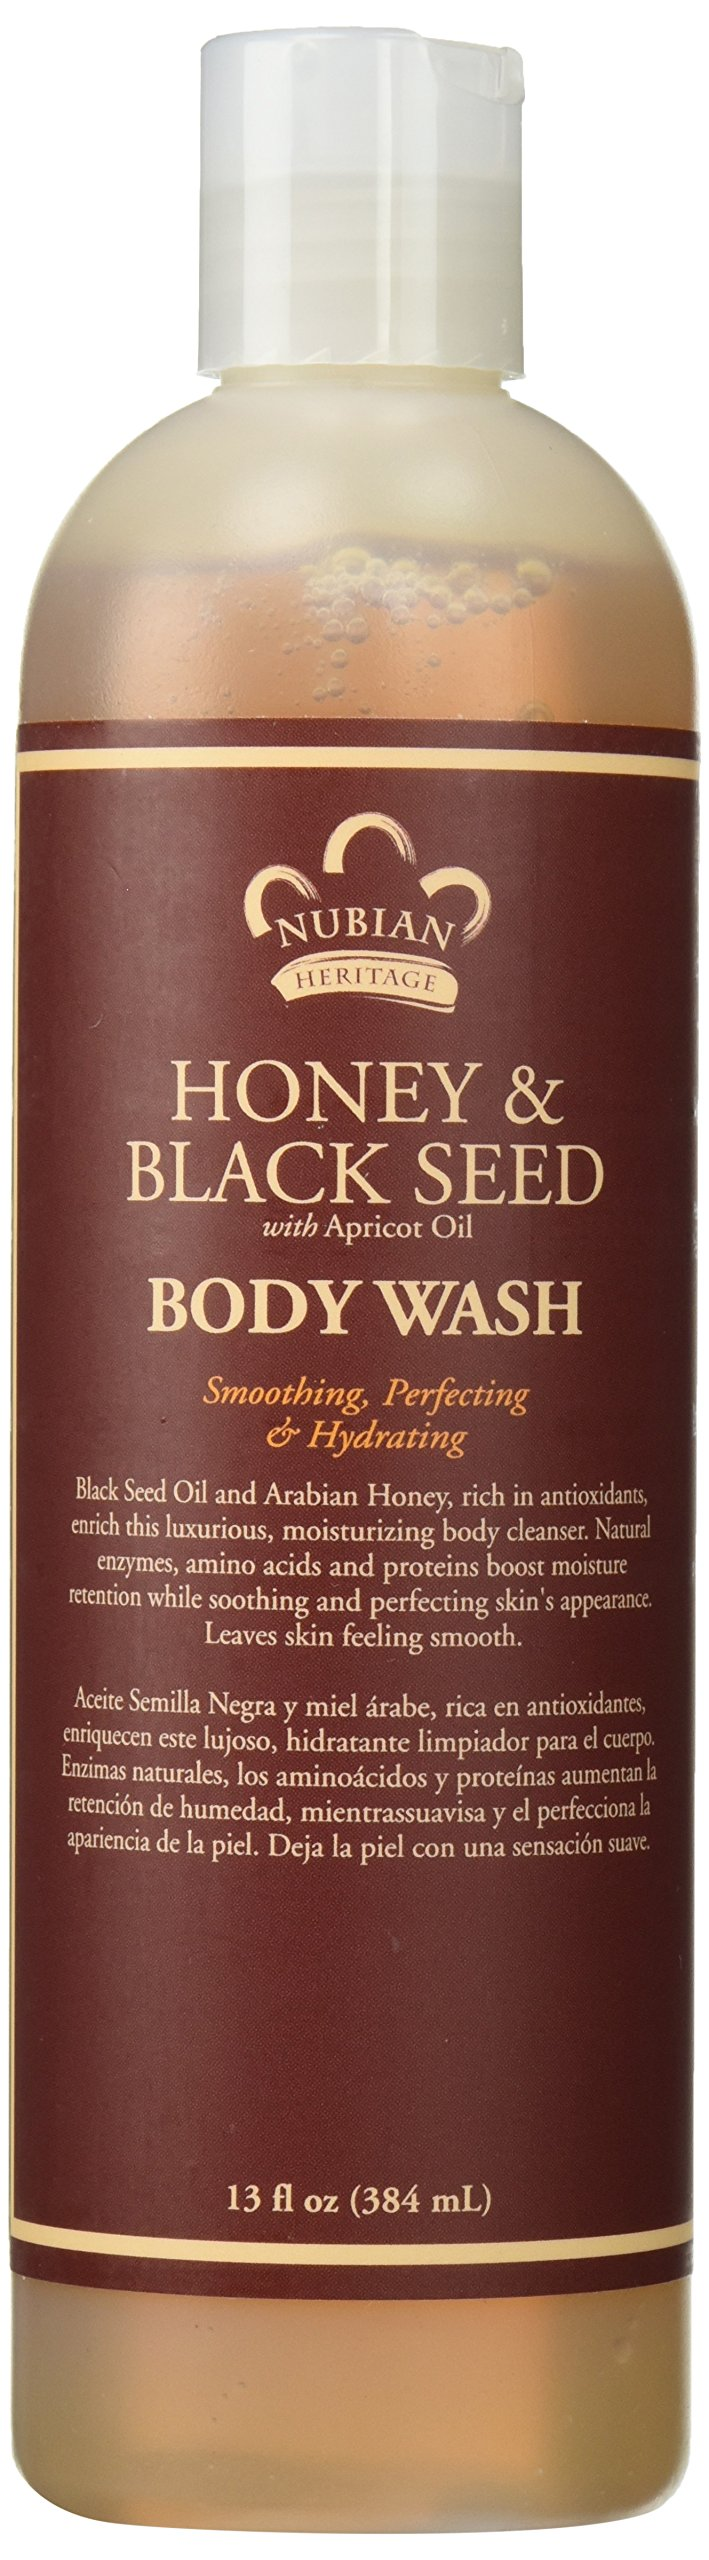 Amazon.com : Nubian Heritage Honey and Black Seed Deodorant With ...